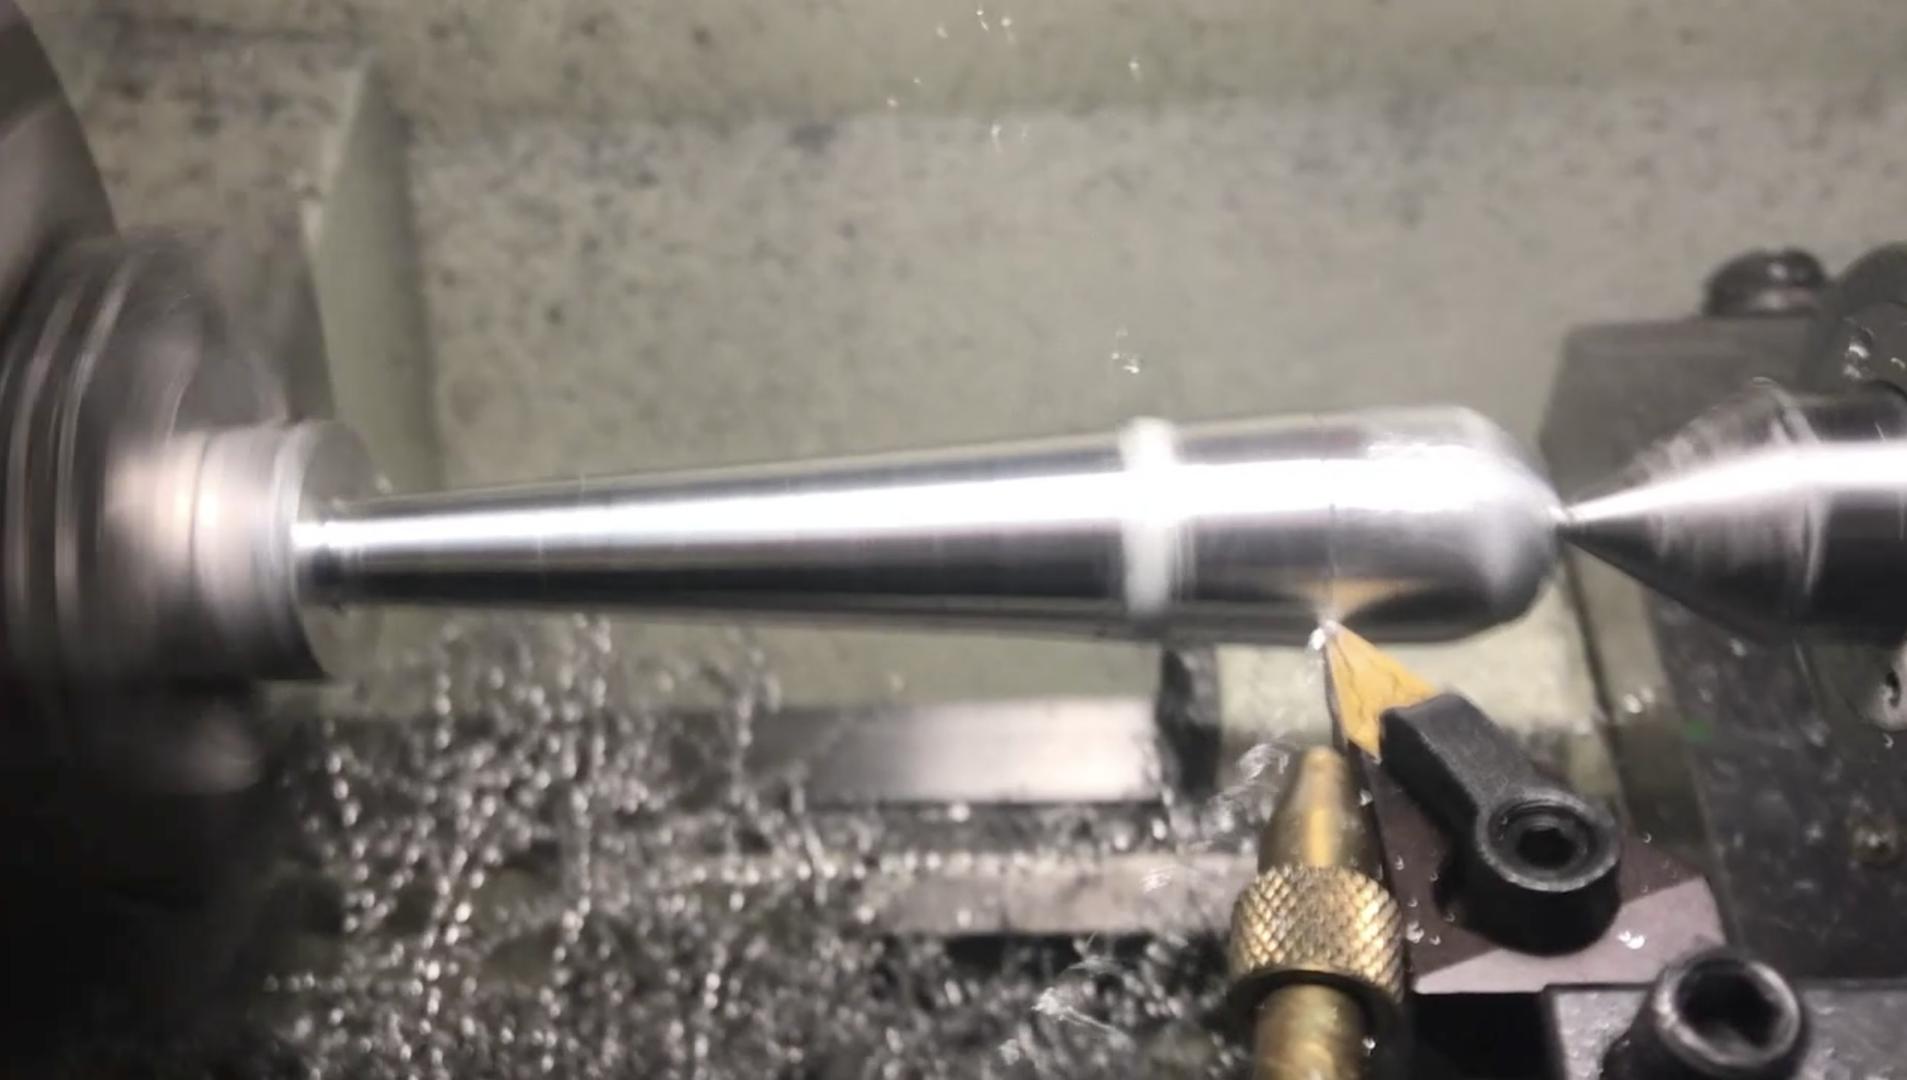 Модернизация токарного станка под работу с ЧПУ - 22